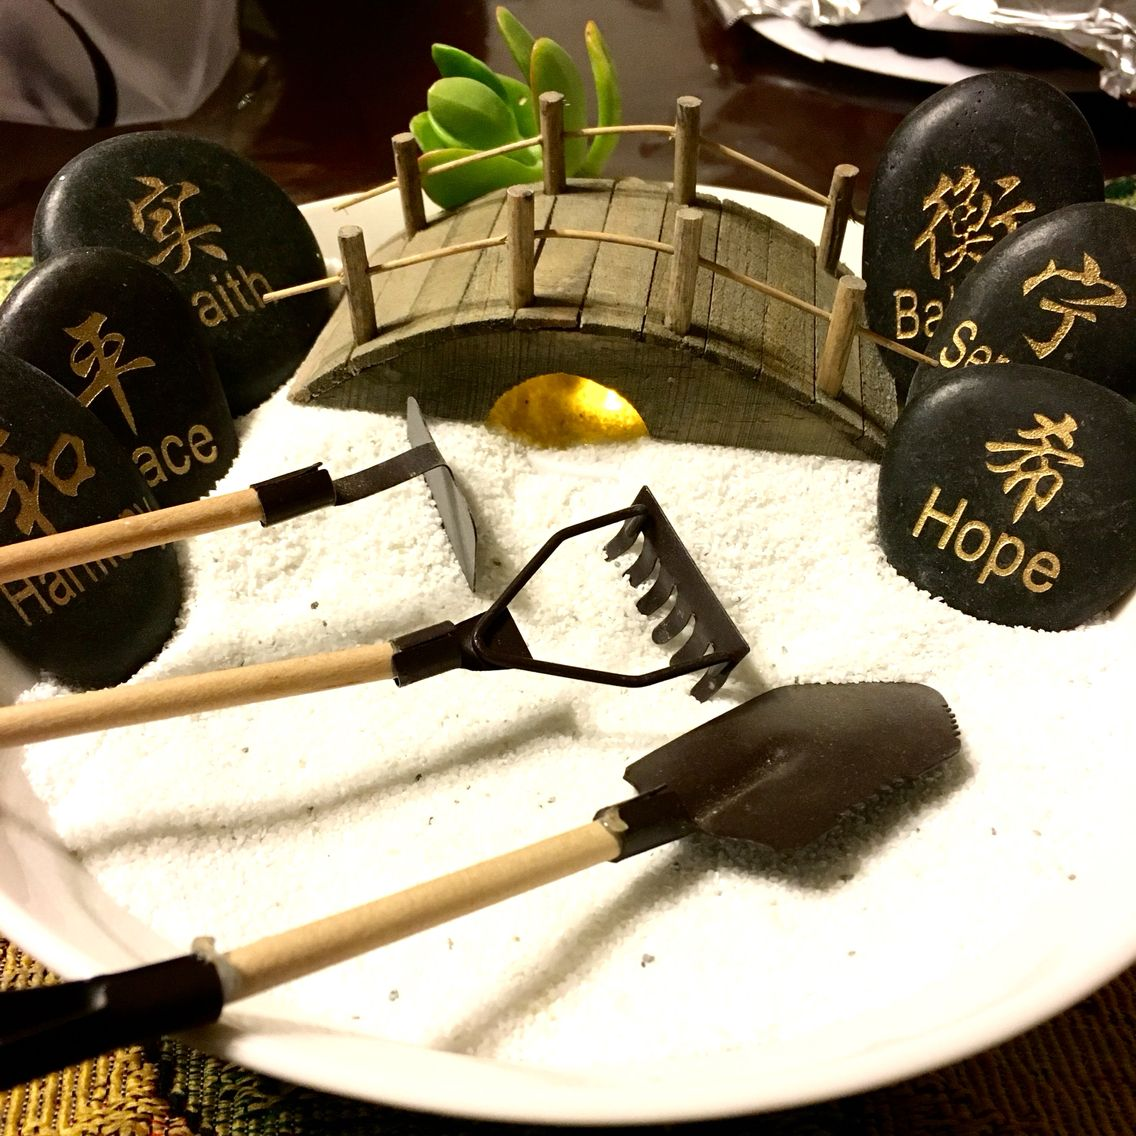 DIY Desk top Mini Zen garden Sand and bowl from the dollar